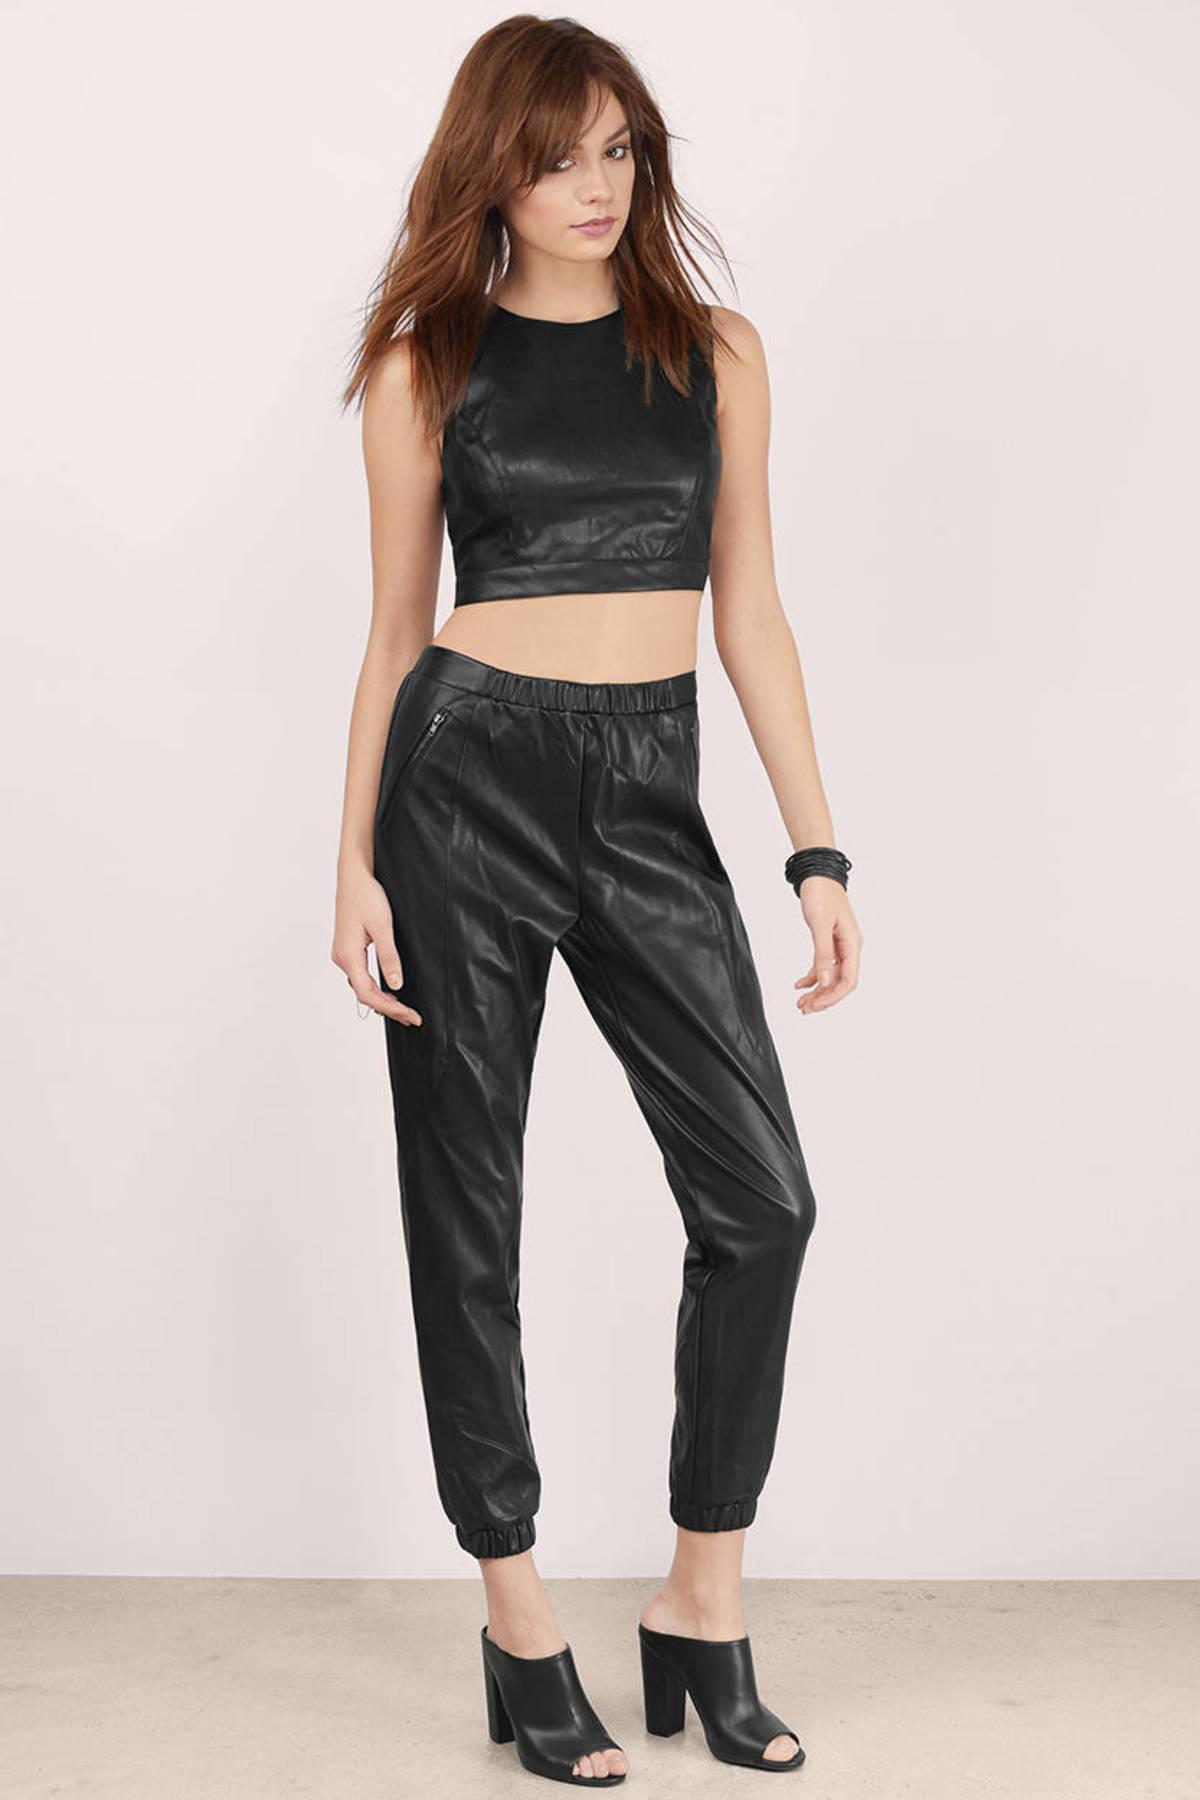 Leather Pants | Shop Leather Pants at Tobi